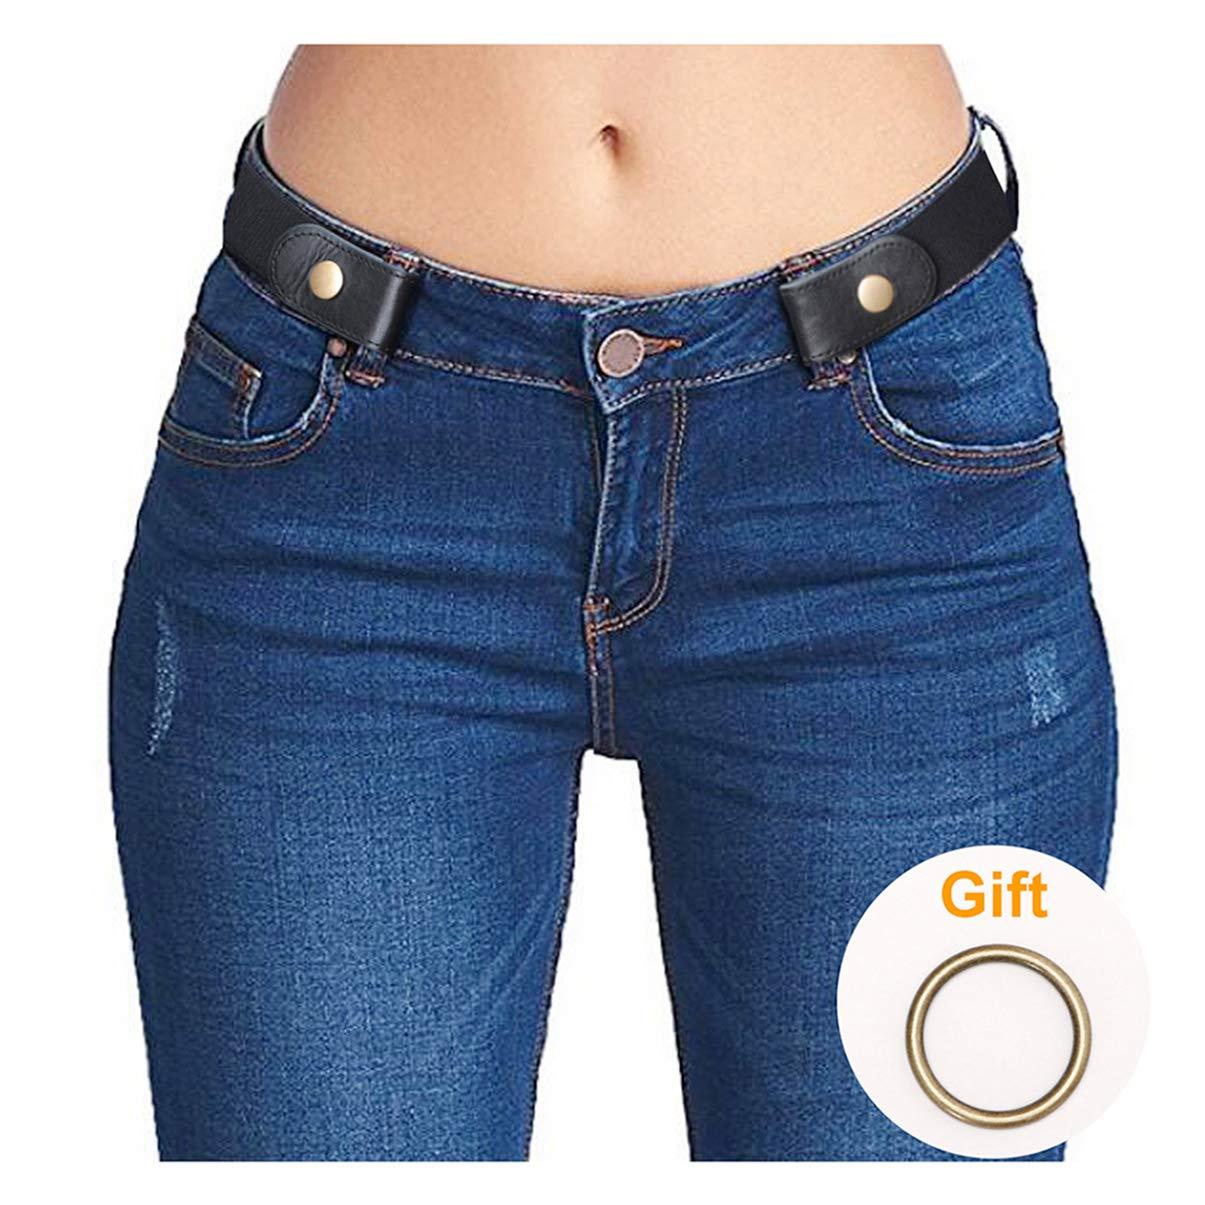 Women Belt Black No Buckle Belt for Jeans,Invisible Belts for Women Plus Size